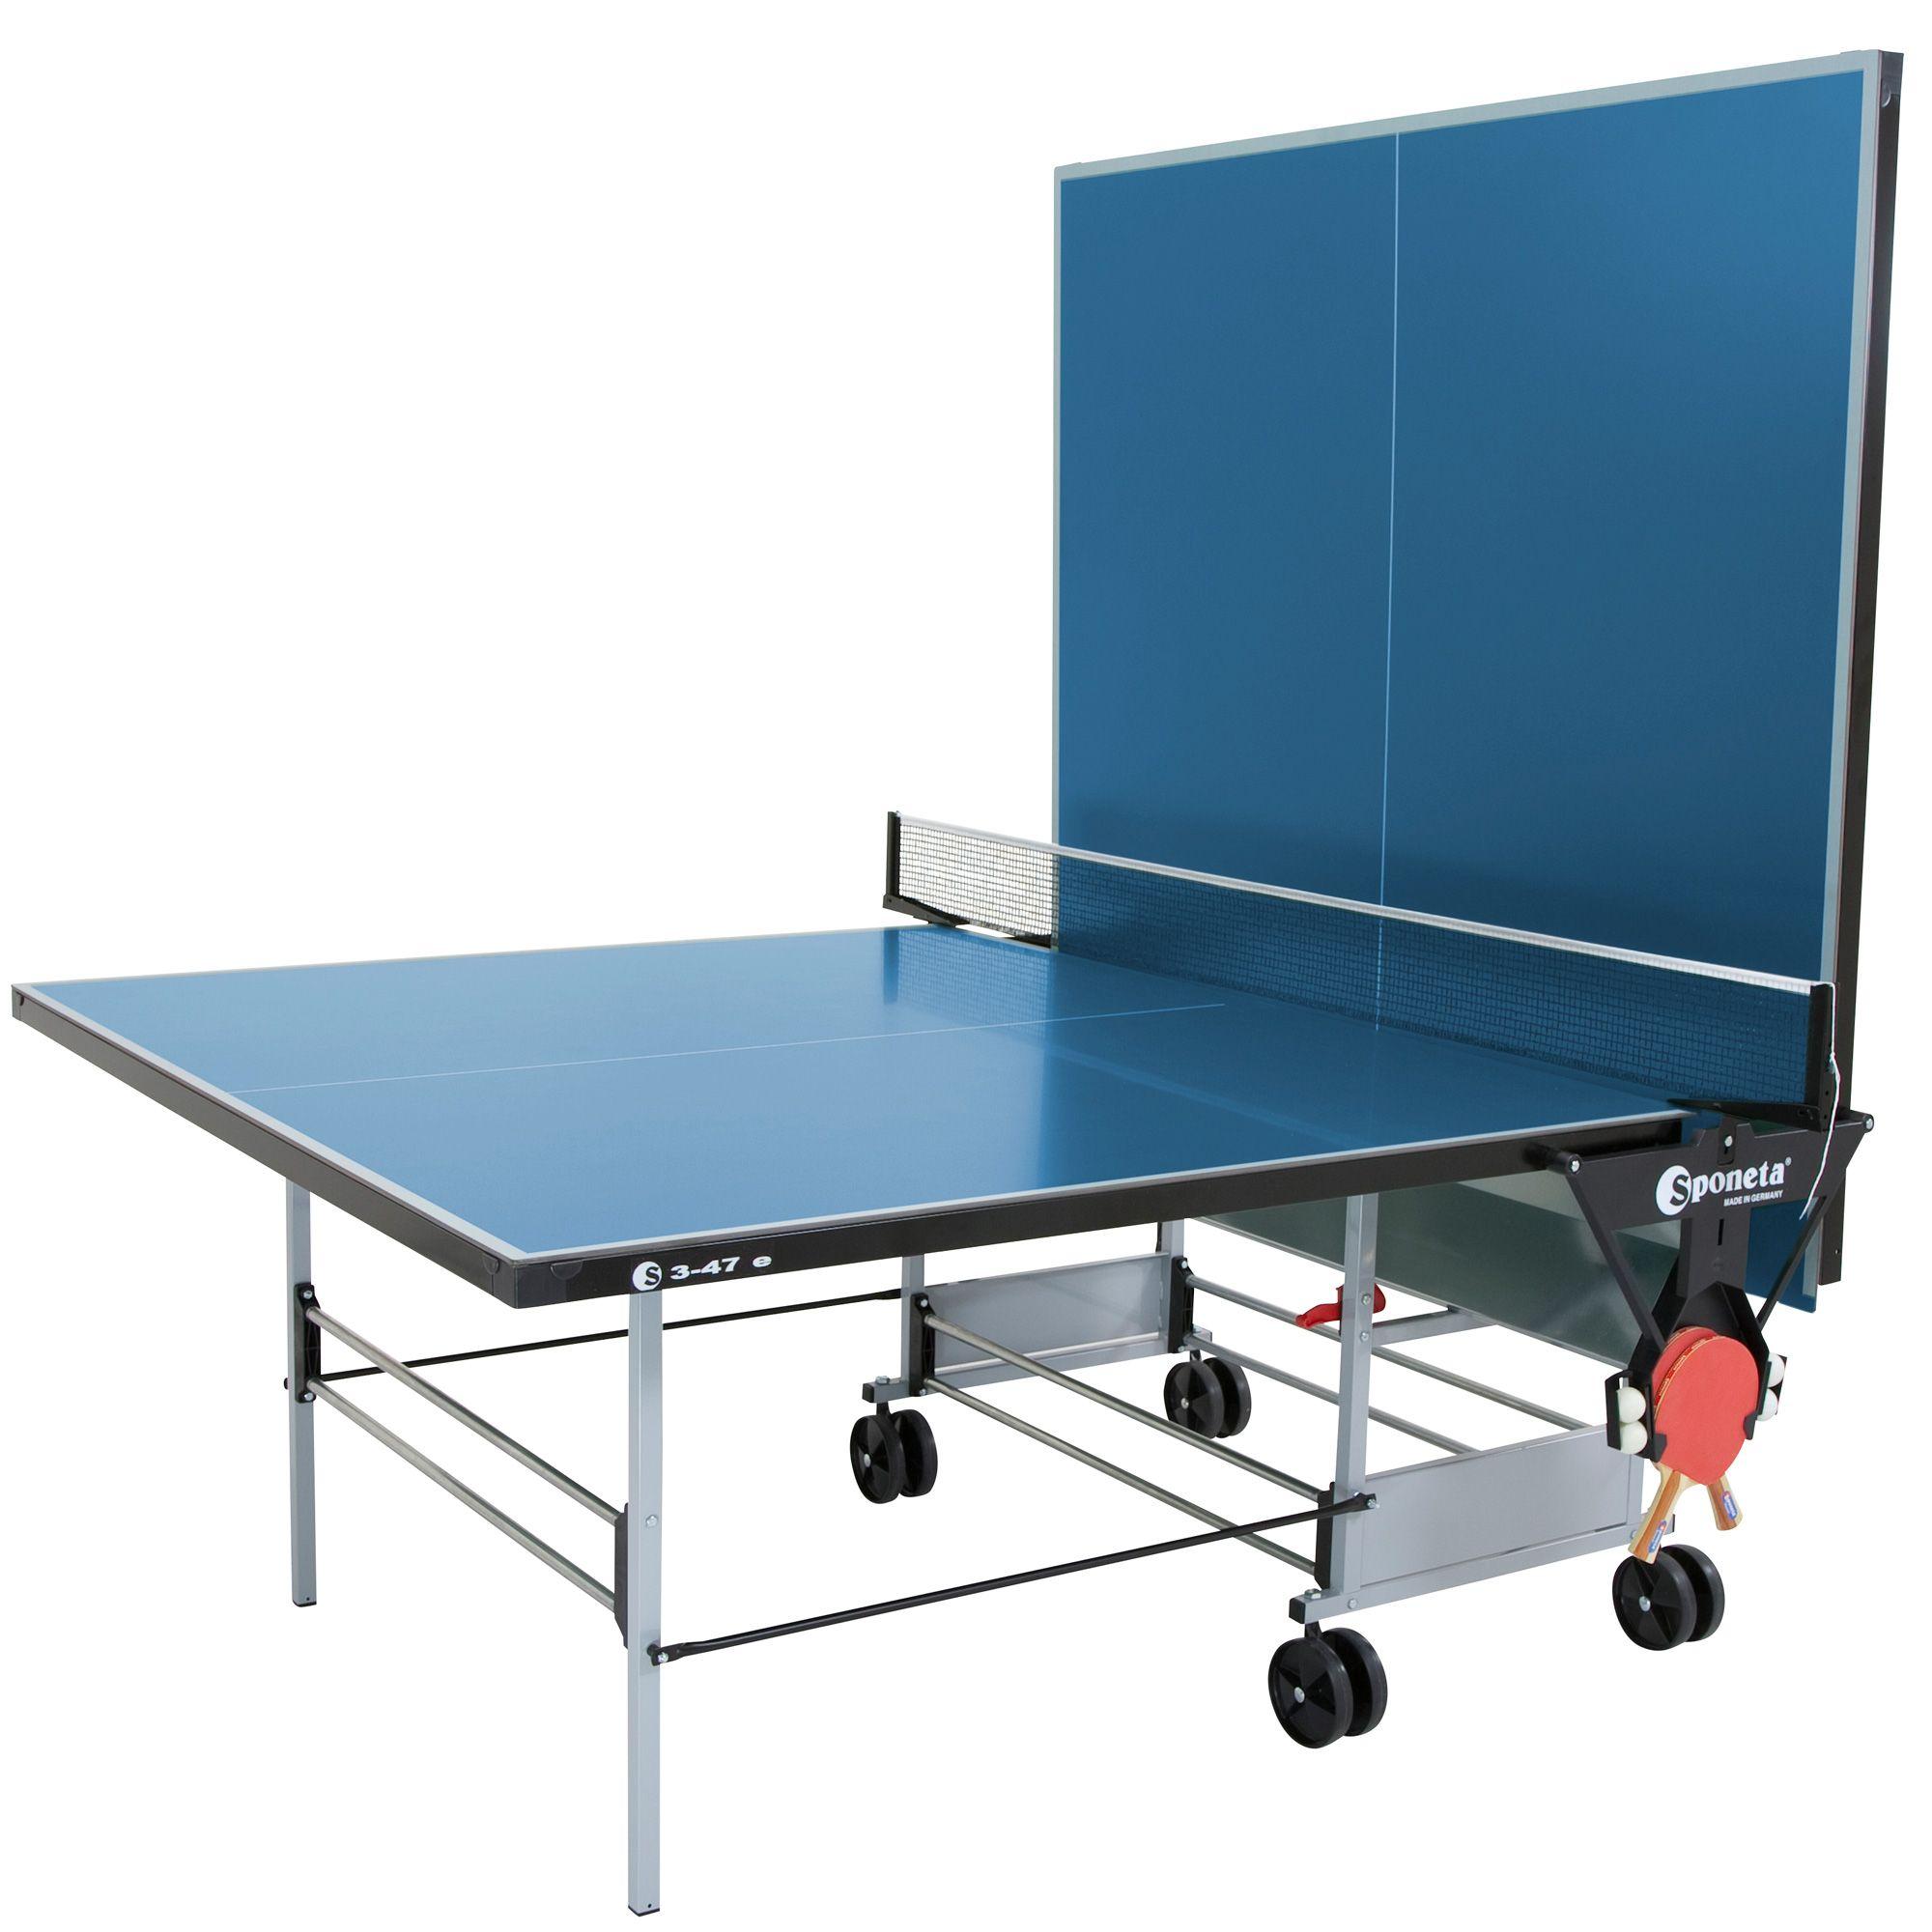 Sponeta sportline outdoor table tennis table - Sponeta table tennis table ...